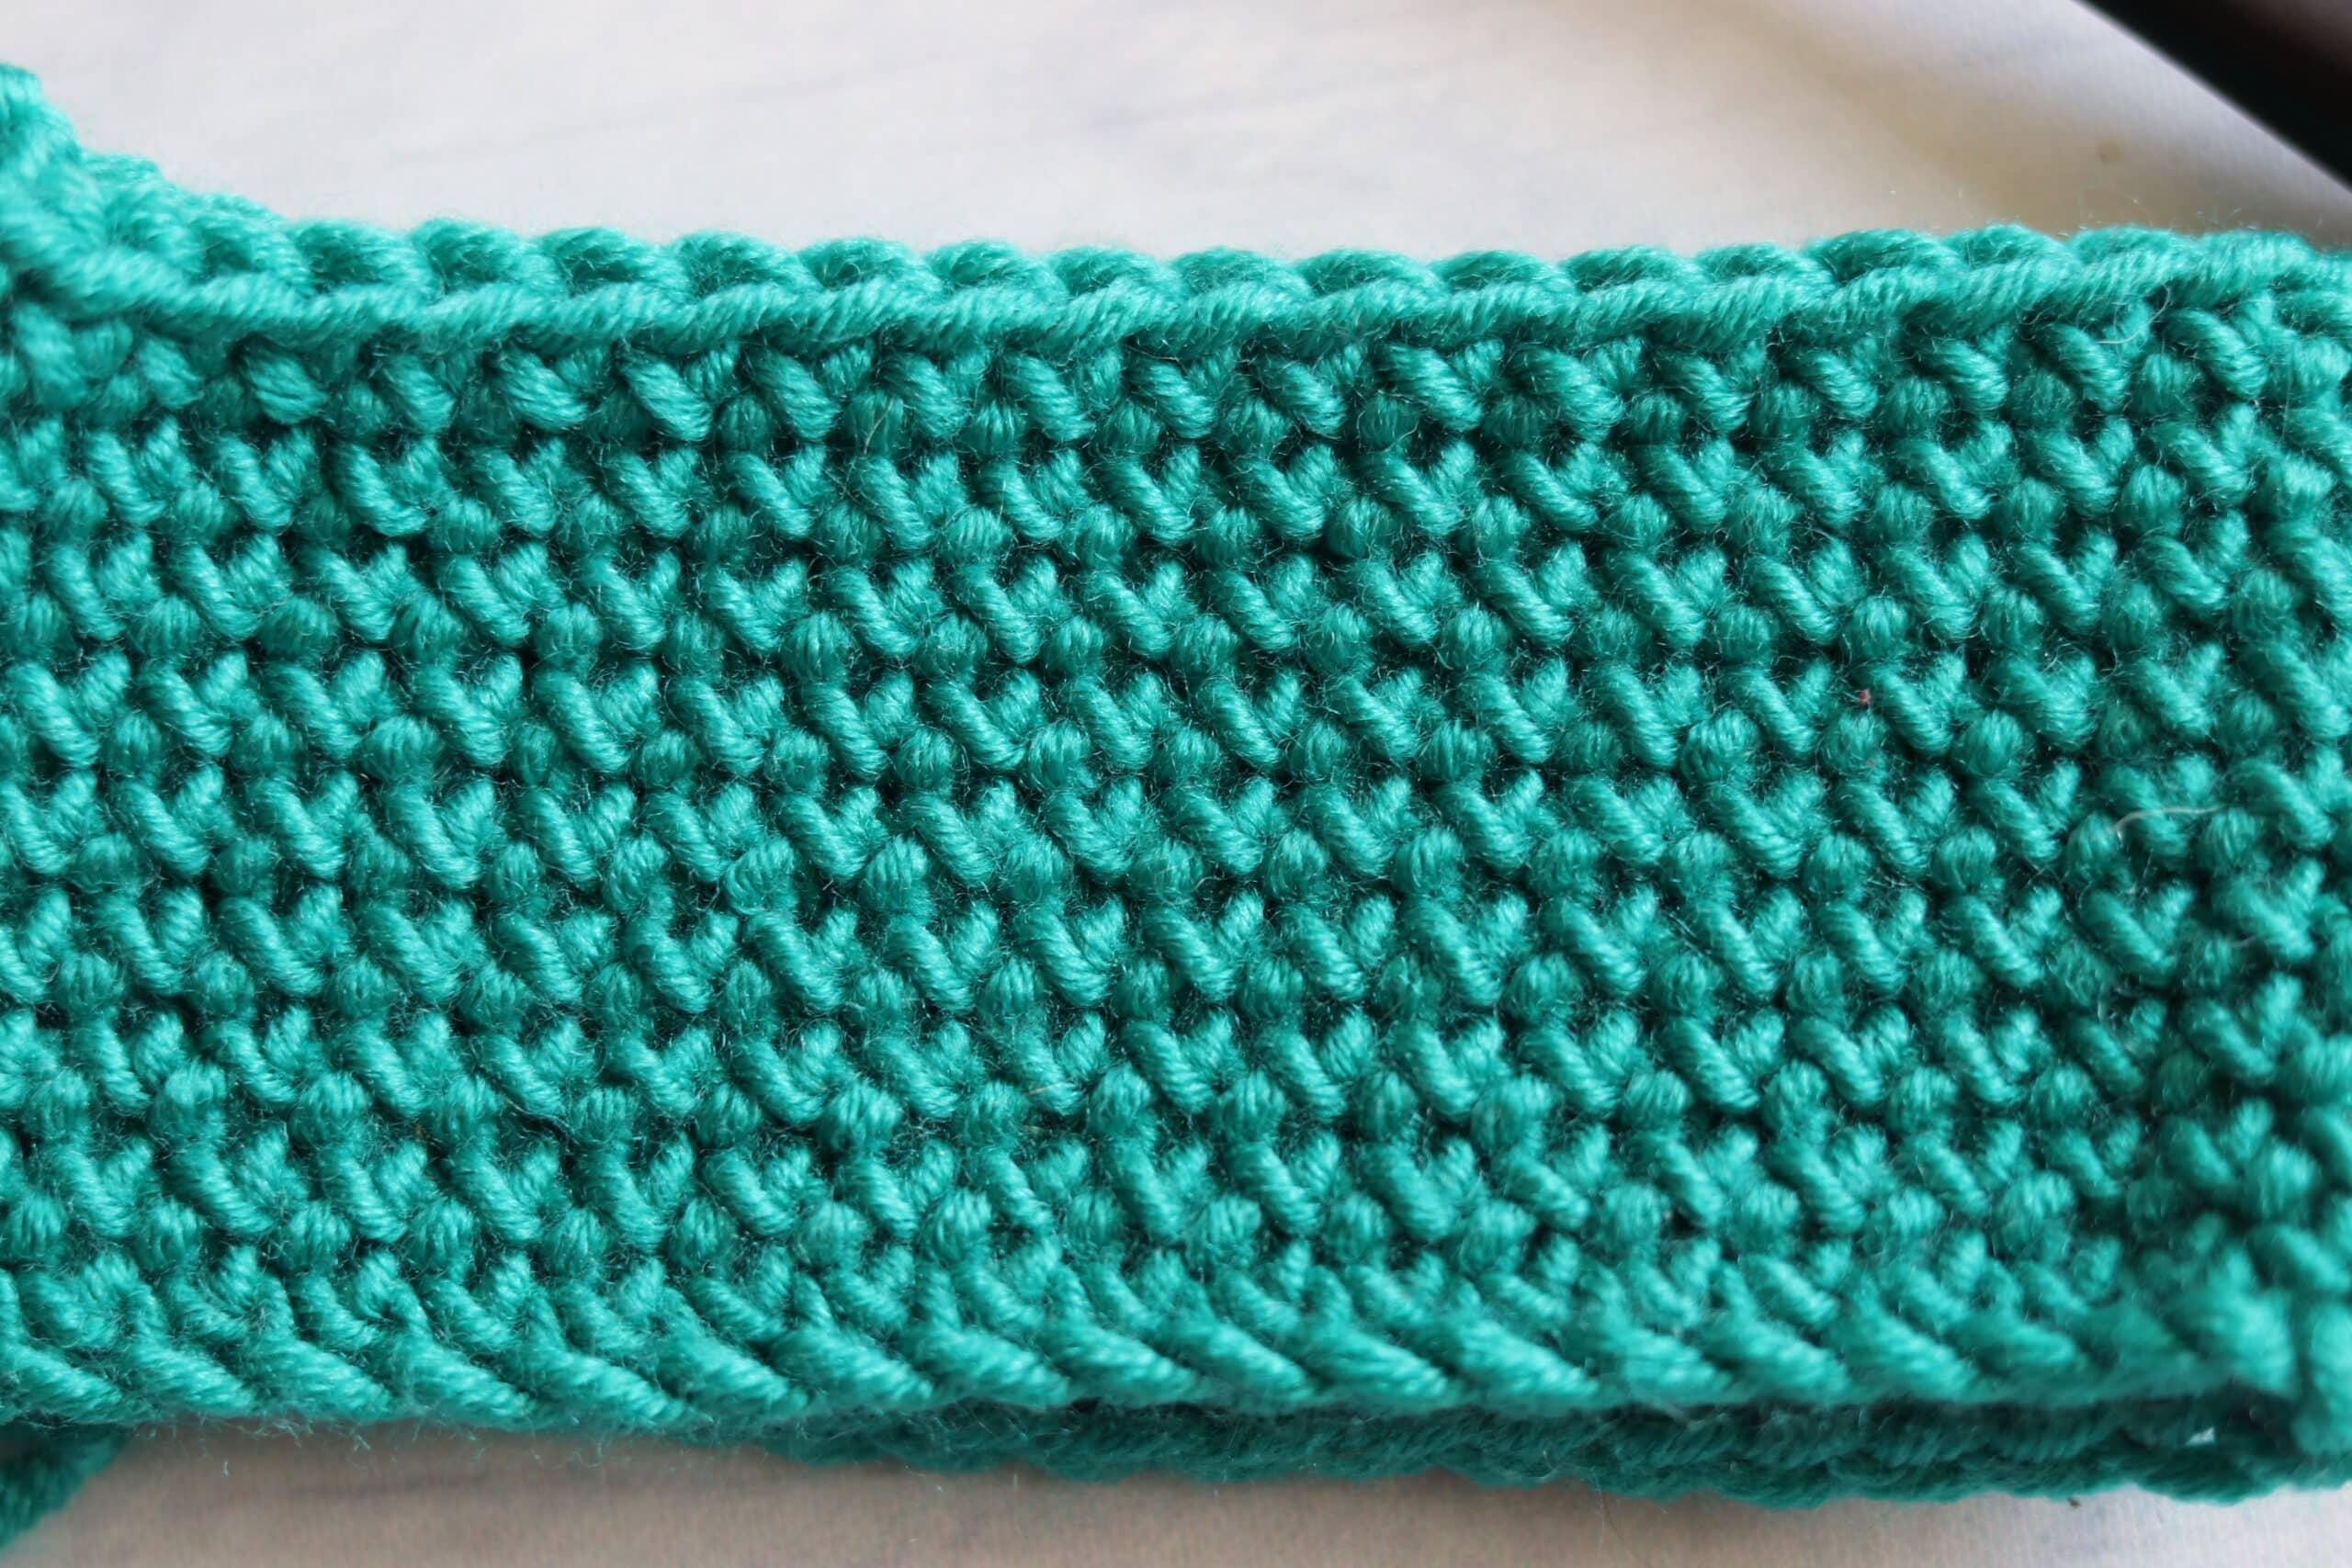 green fabric close up cross stitch